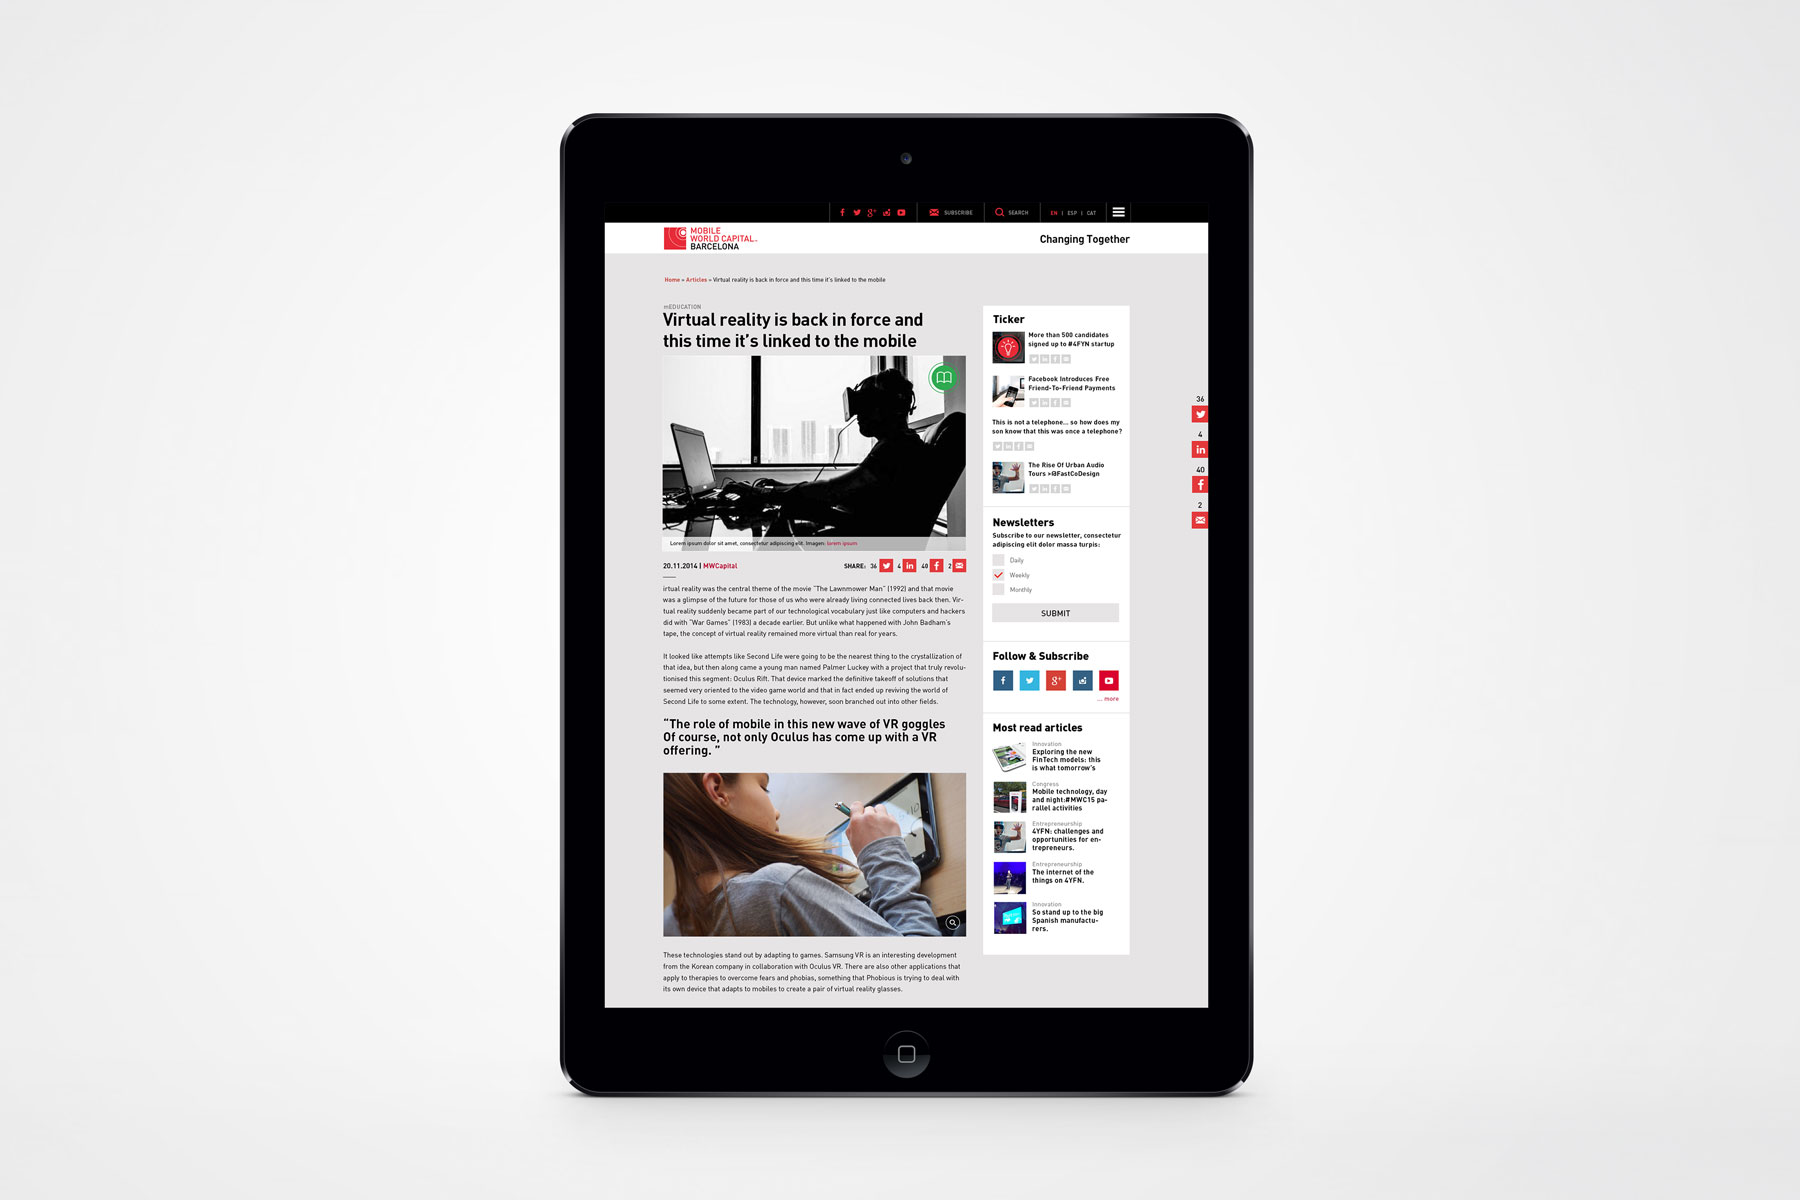 MWC-iPad1